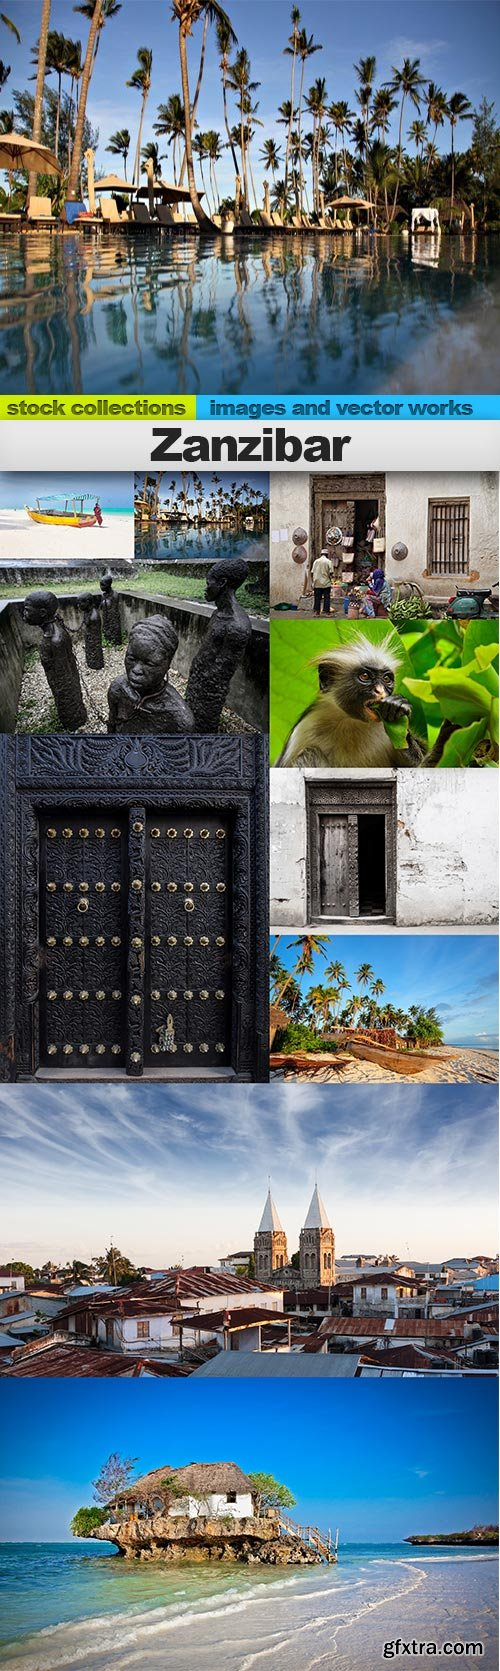 Zanzibar, 10 x UHQ JPEG